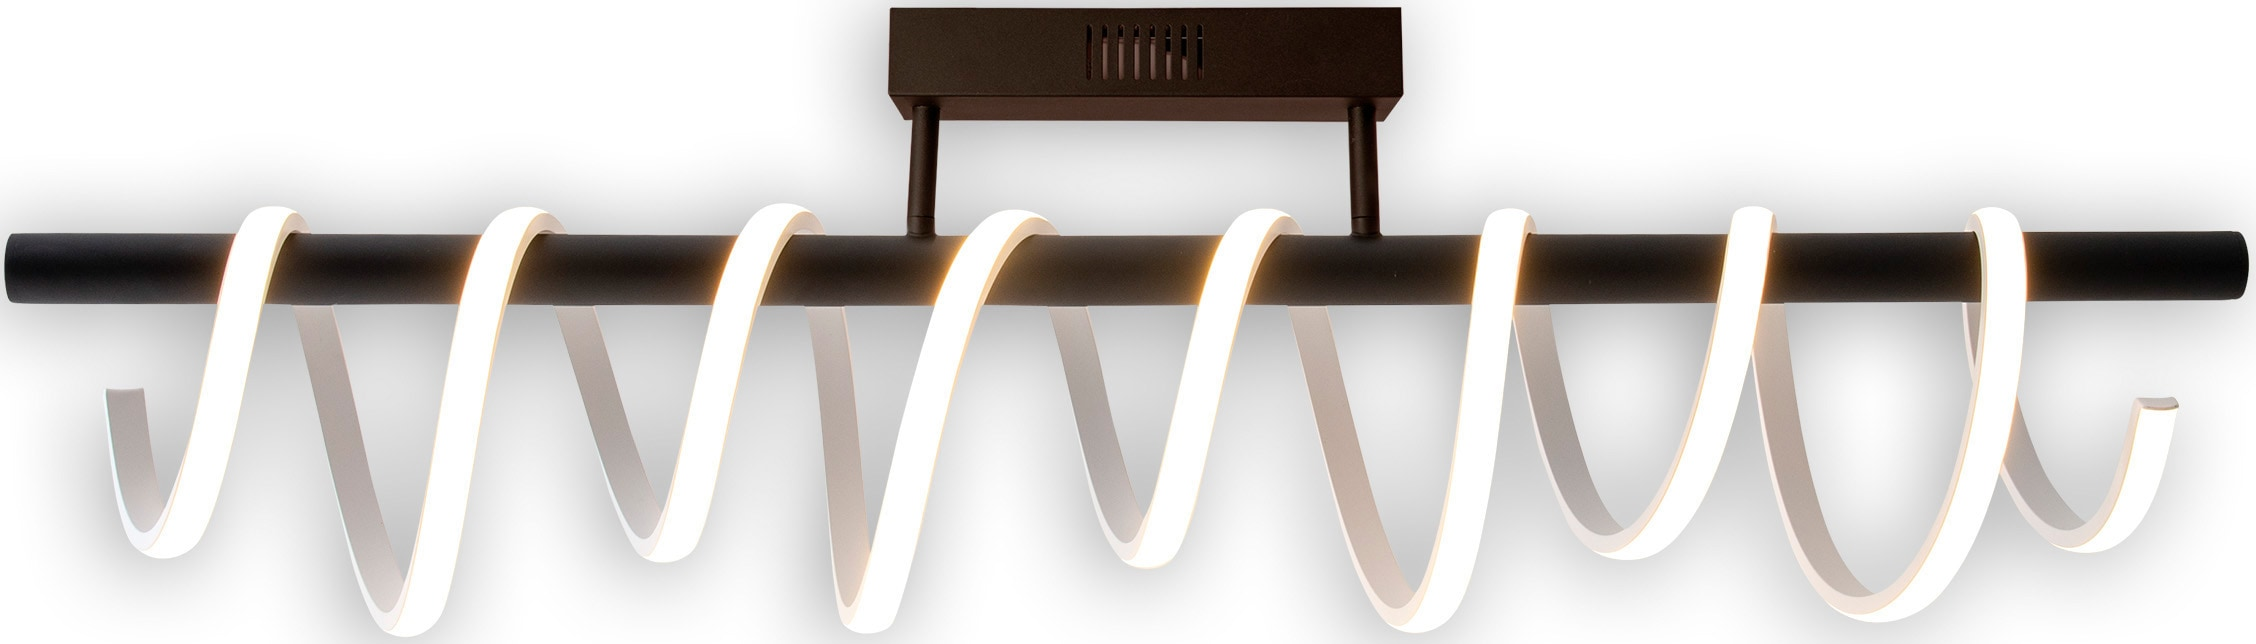 näve LED Deckenleuchte Belleza, LED-Board, 1 St., Warmweiß, in 3 Stufen dimmbar